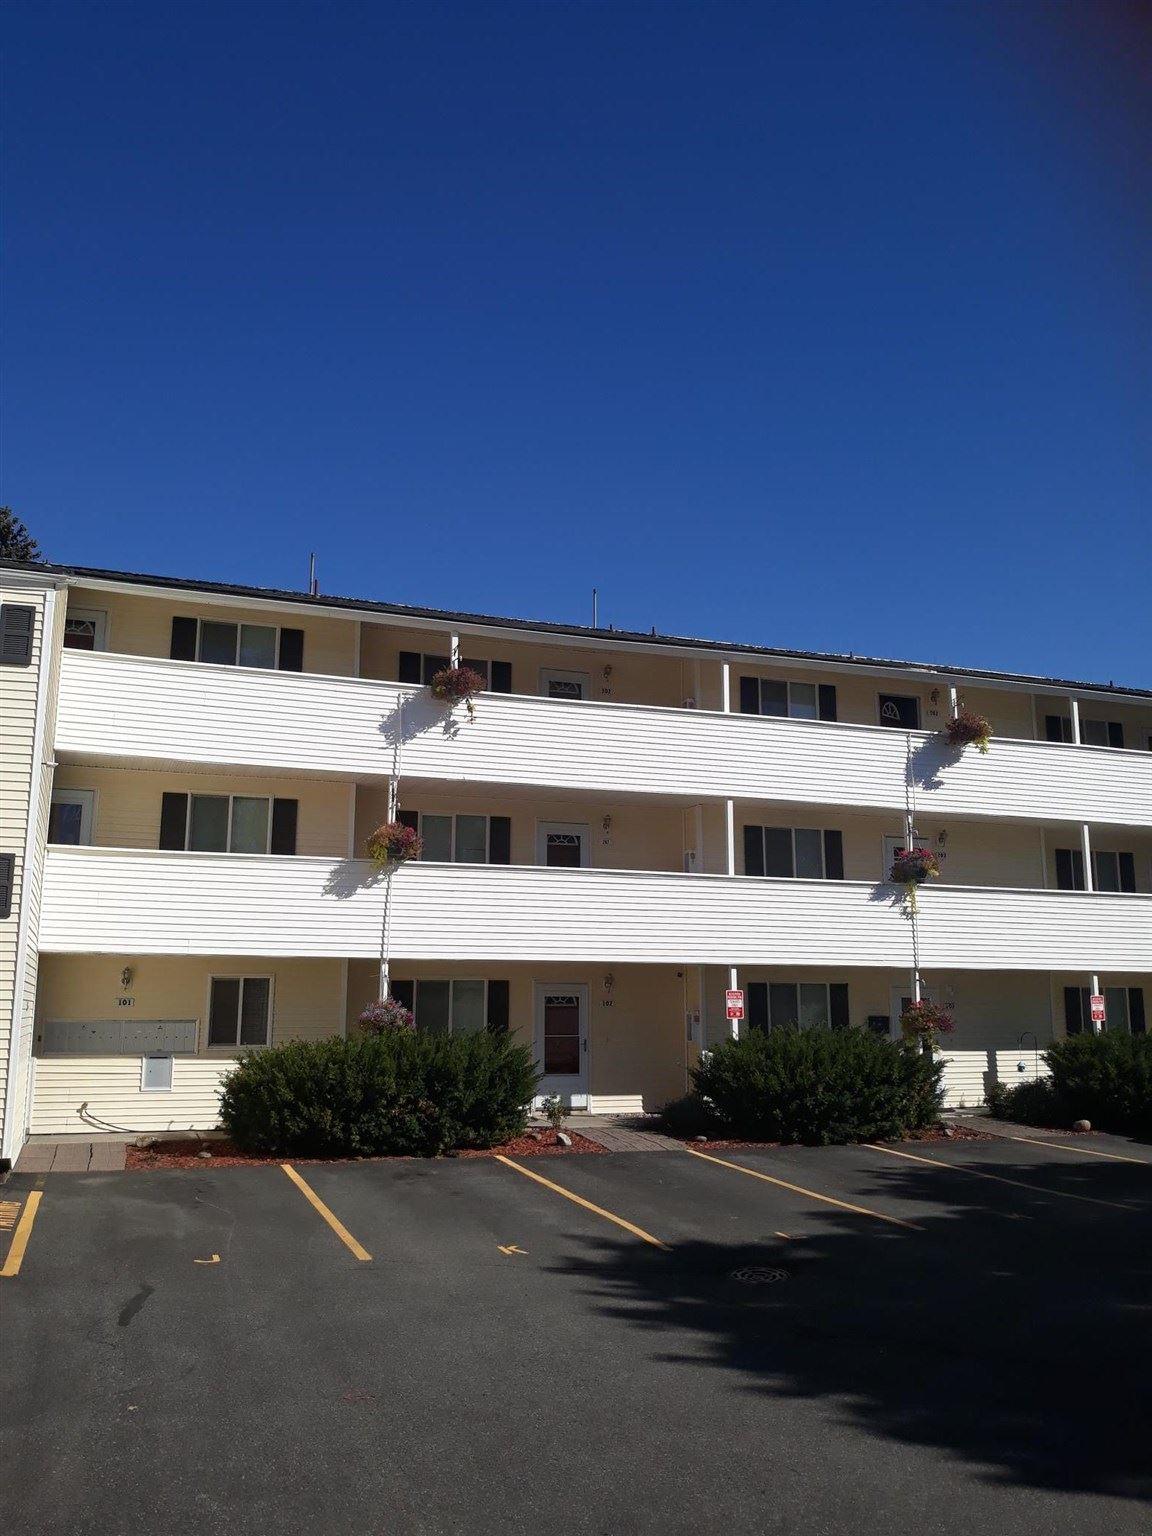 222 N Hutchinson Rd #302, Spokane Valley, WA 99212 - #: 202122796